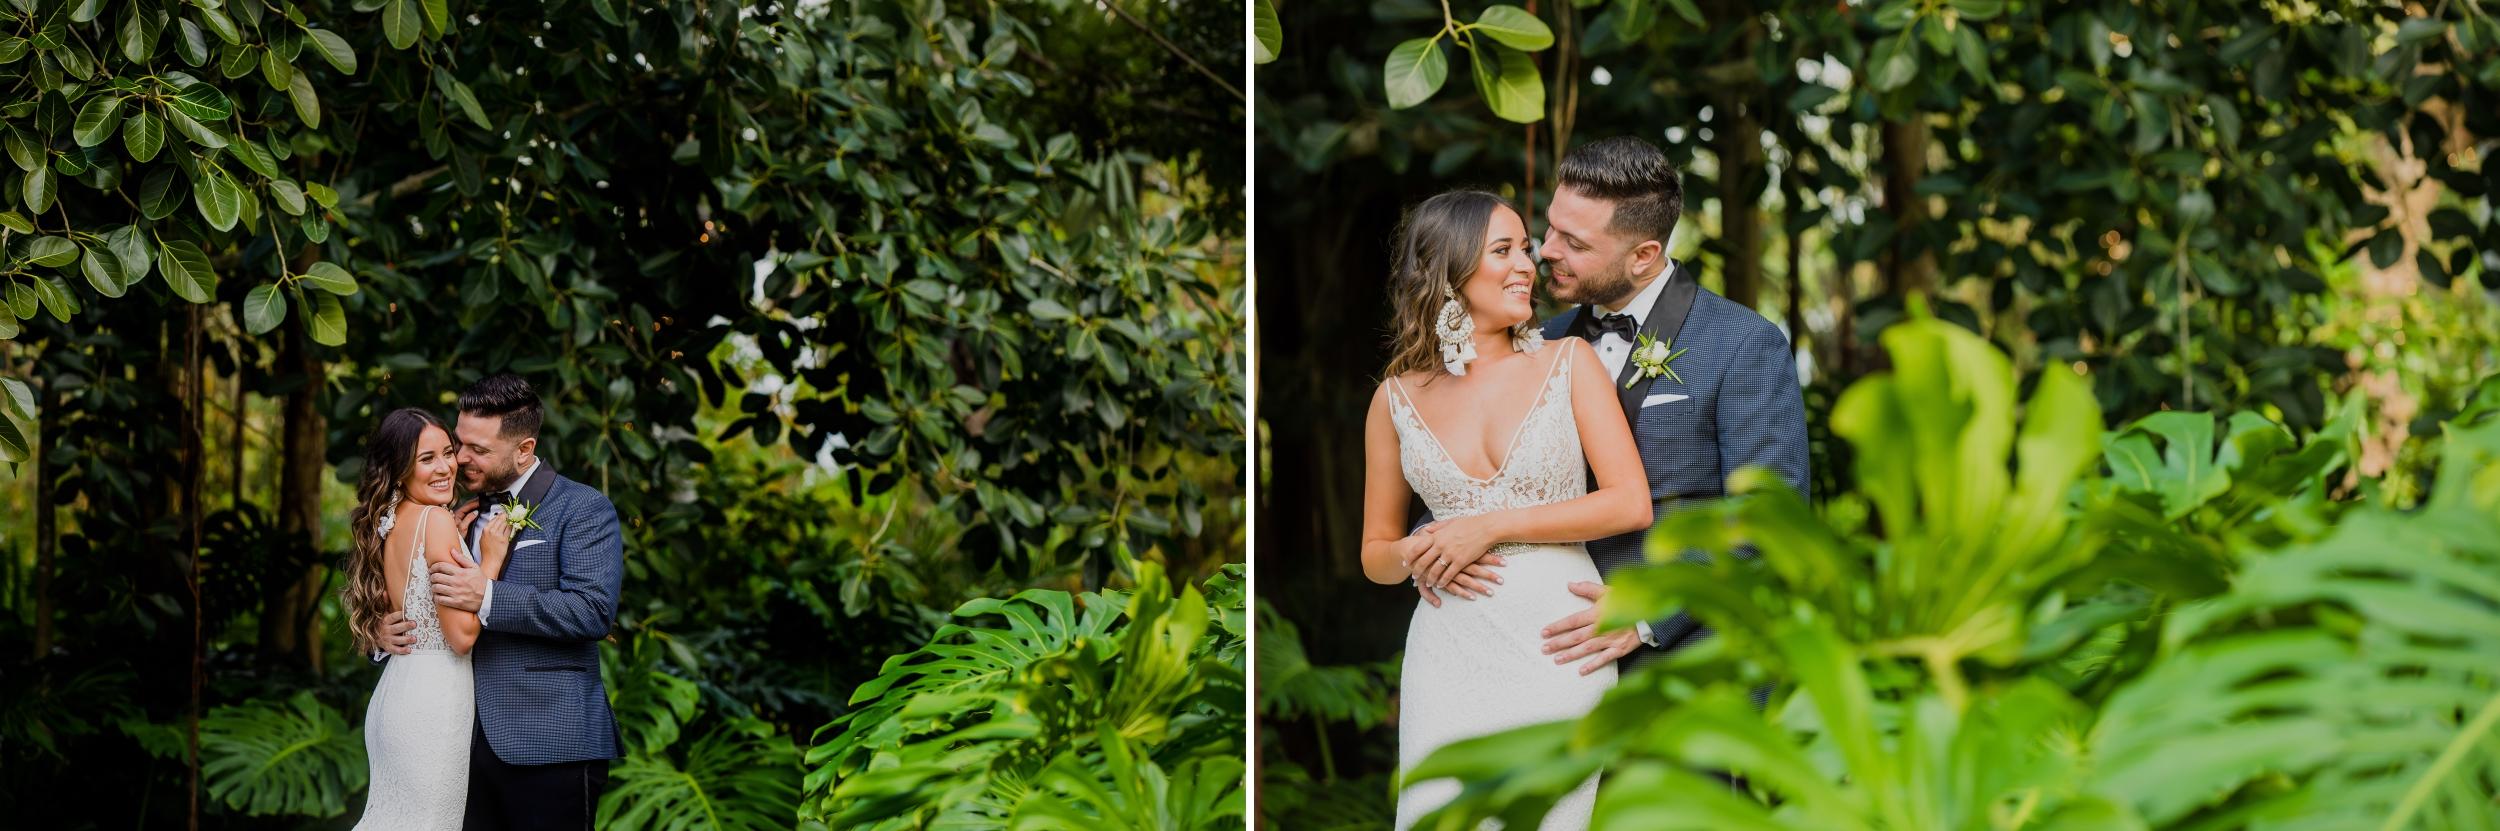 Wedding Whimsical Key West House  - Photography by Santy Martinez 10.jpg